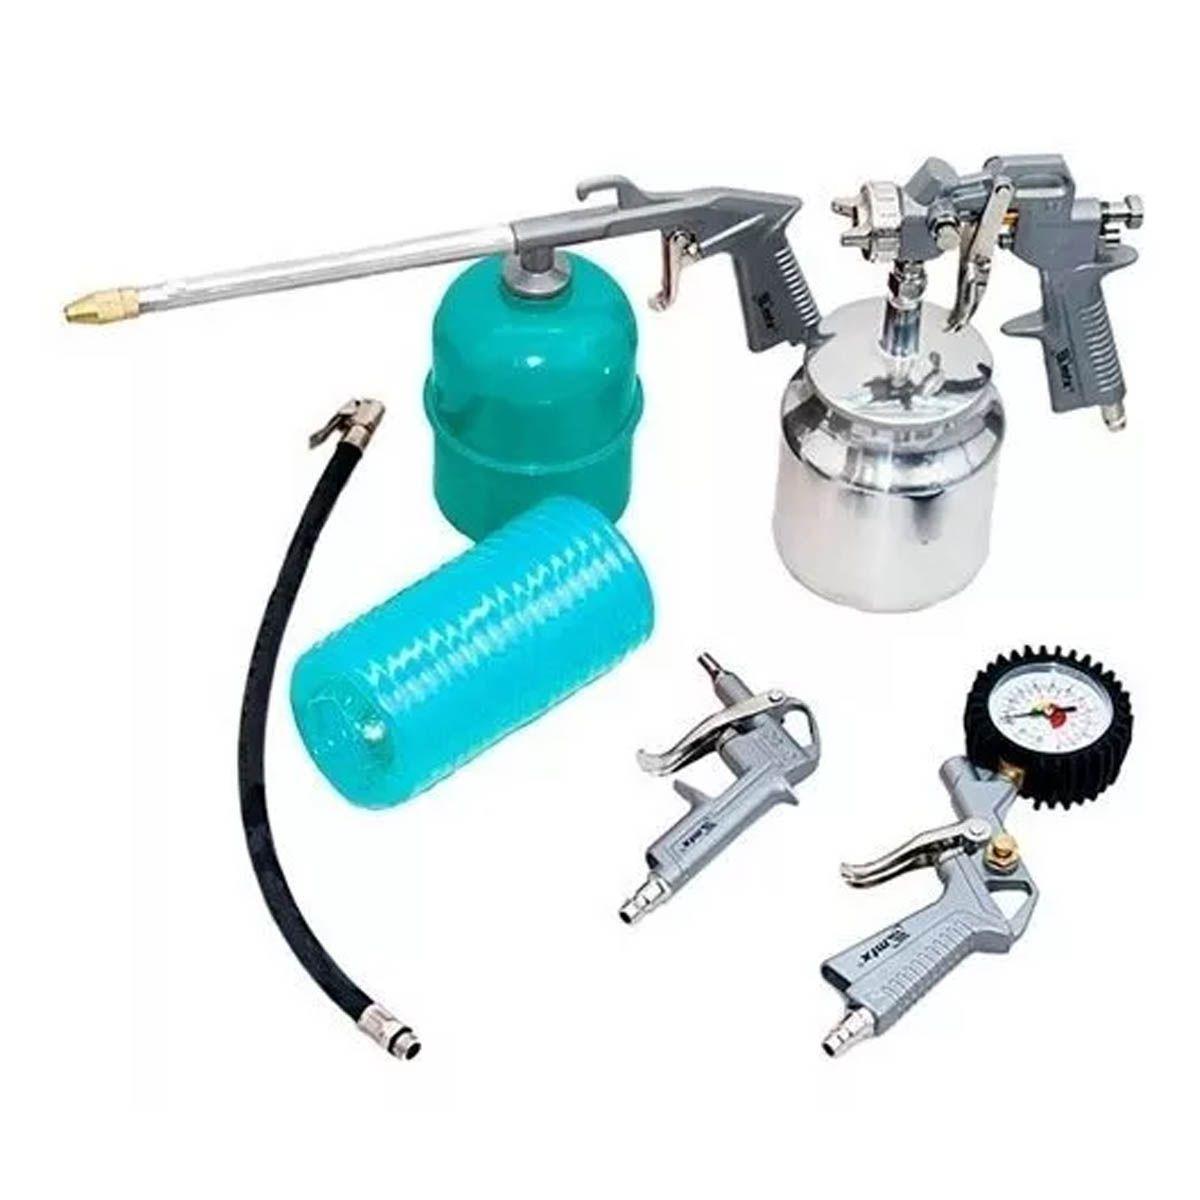 Kit Pintura Pneumático Compressor Stels Tanque Baixo